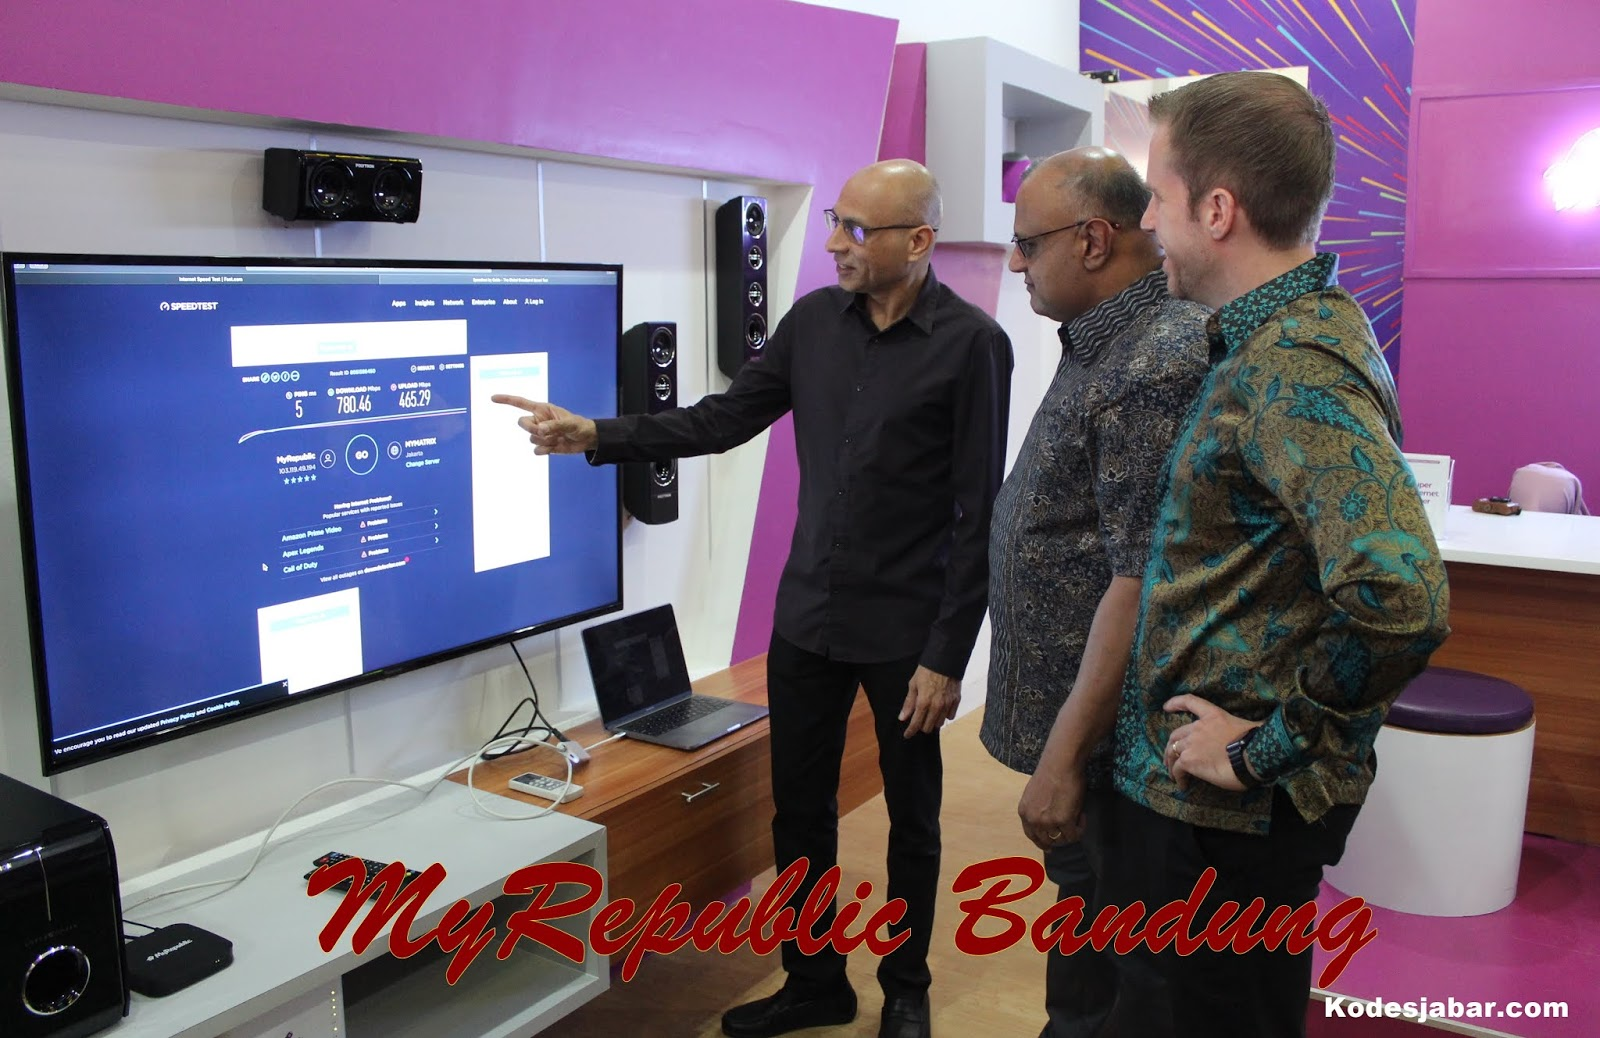 MyRepublic Hadir di Bandung Menjadi Pilihan Untuk Internetan Cepat Tanpa Putus-putus